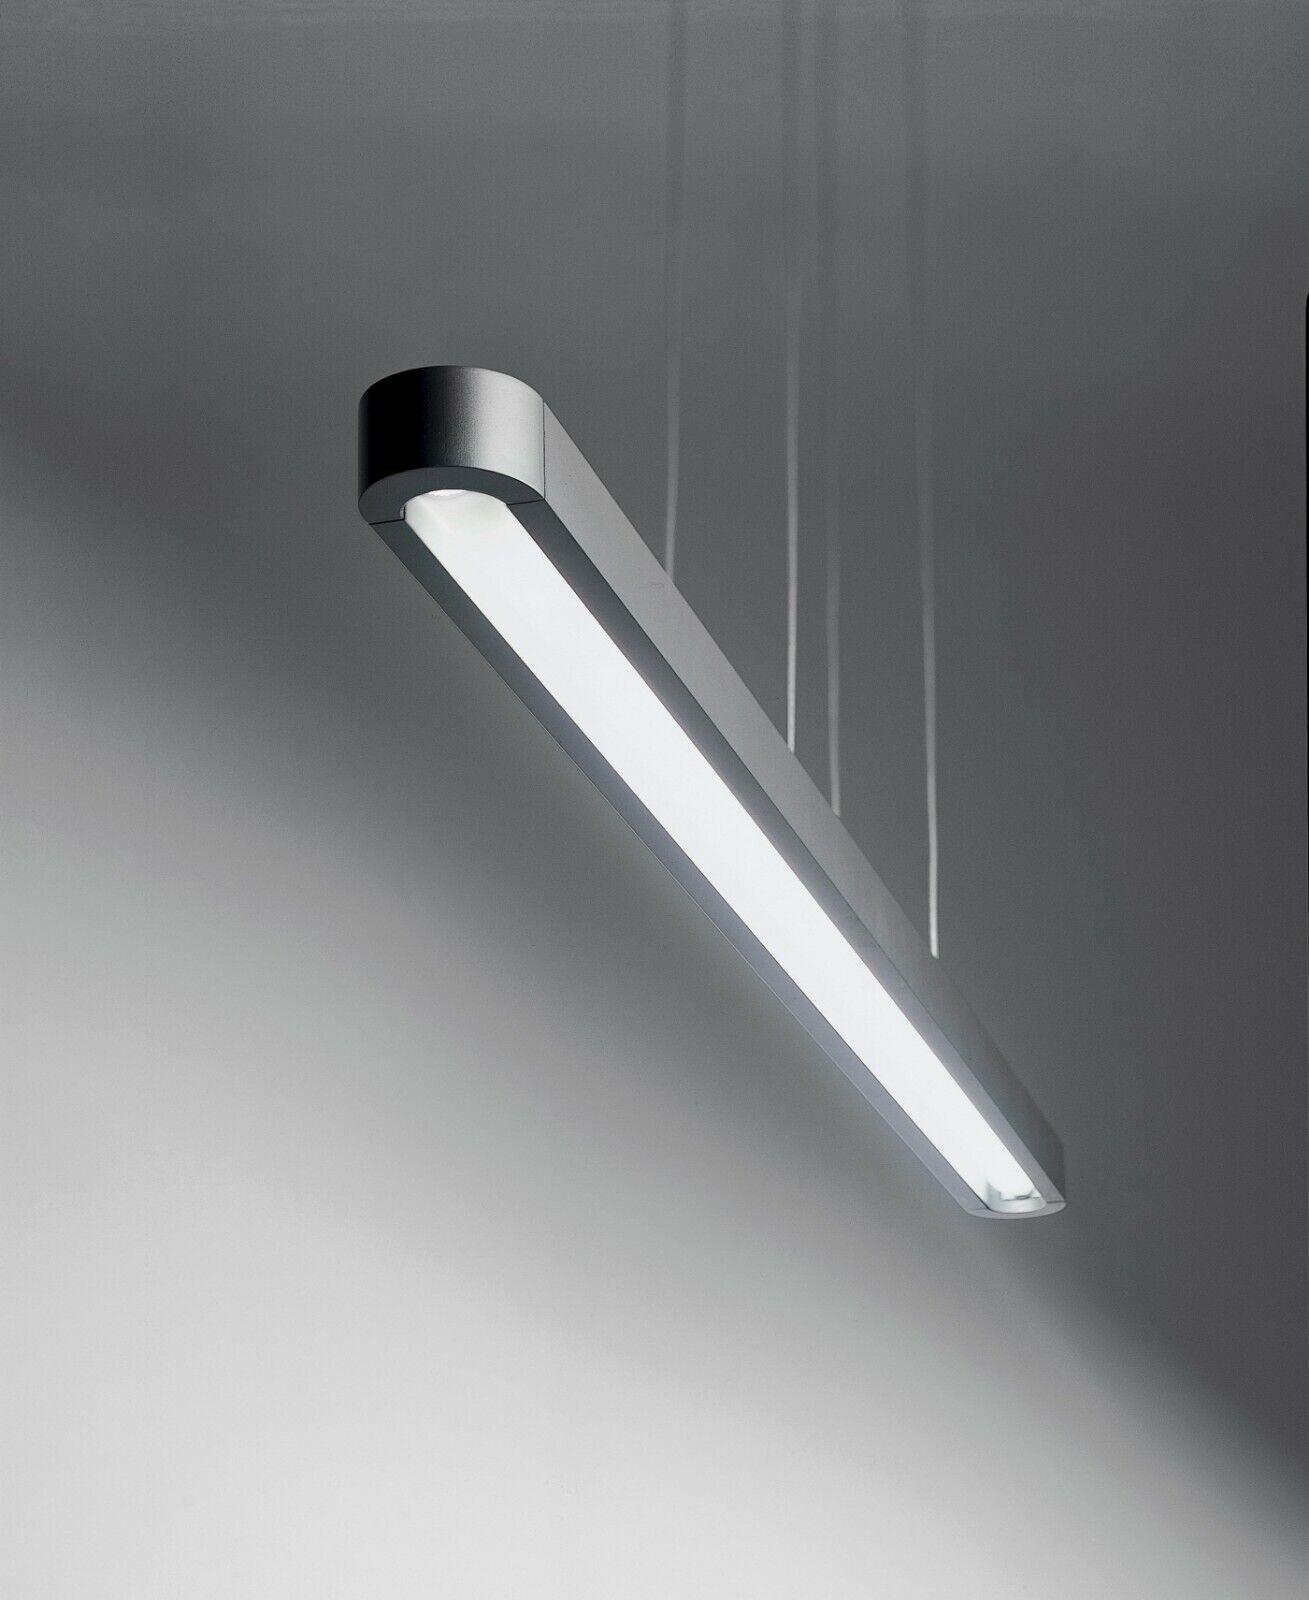 Artemide Talo LED 3000K lampada a sospensione - No dimmer - design Neil Poulton